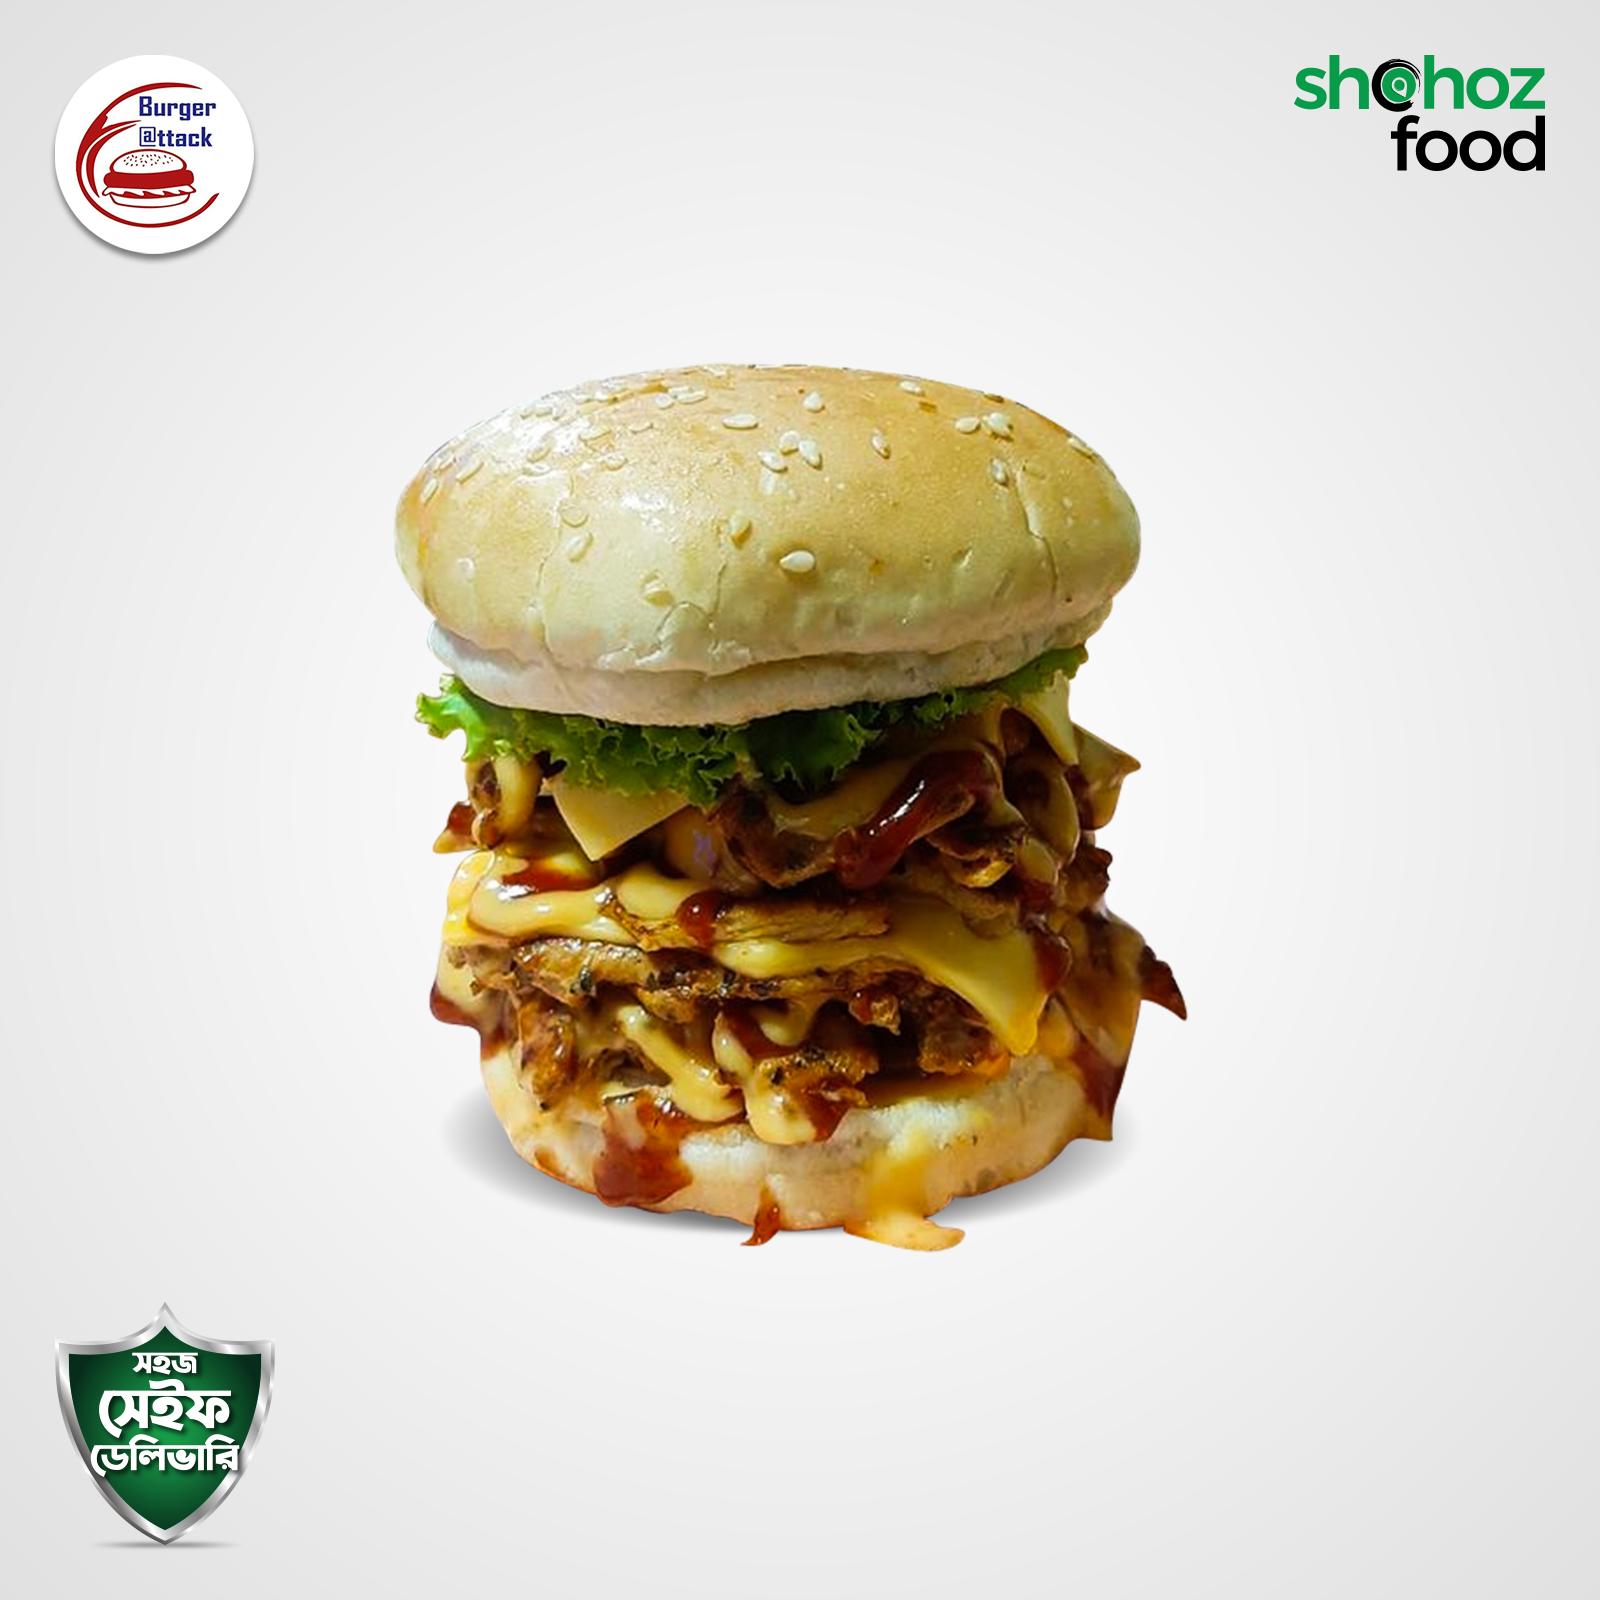 Burger Attack Restaurant Review